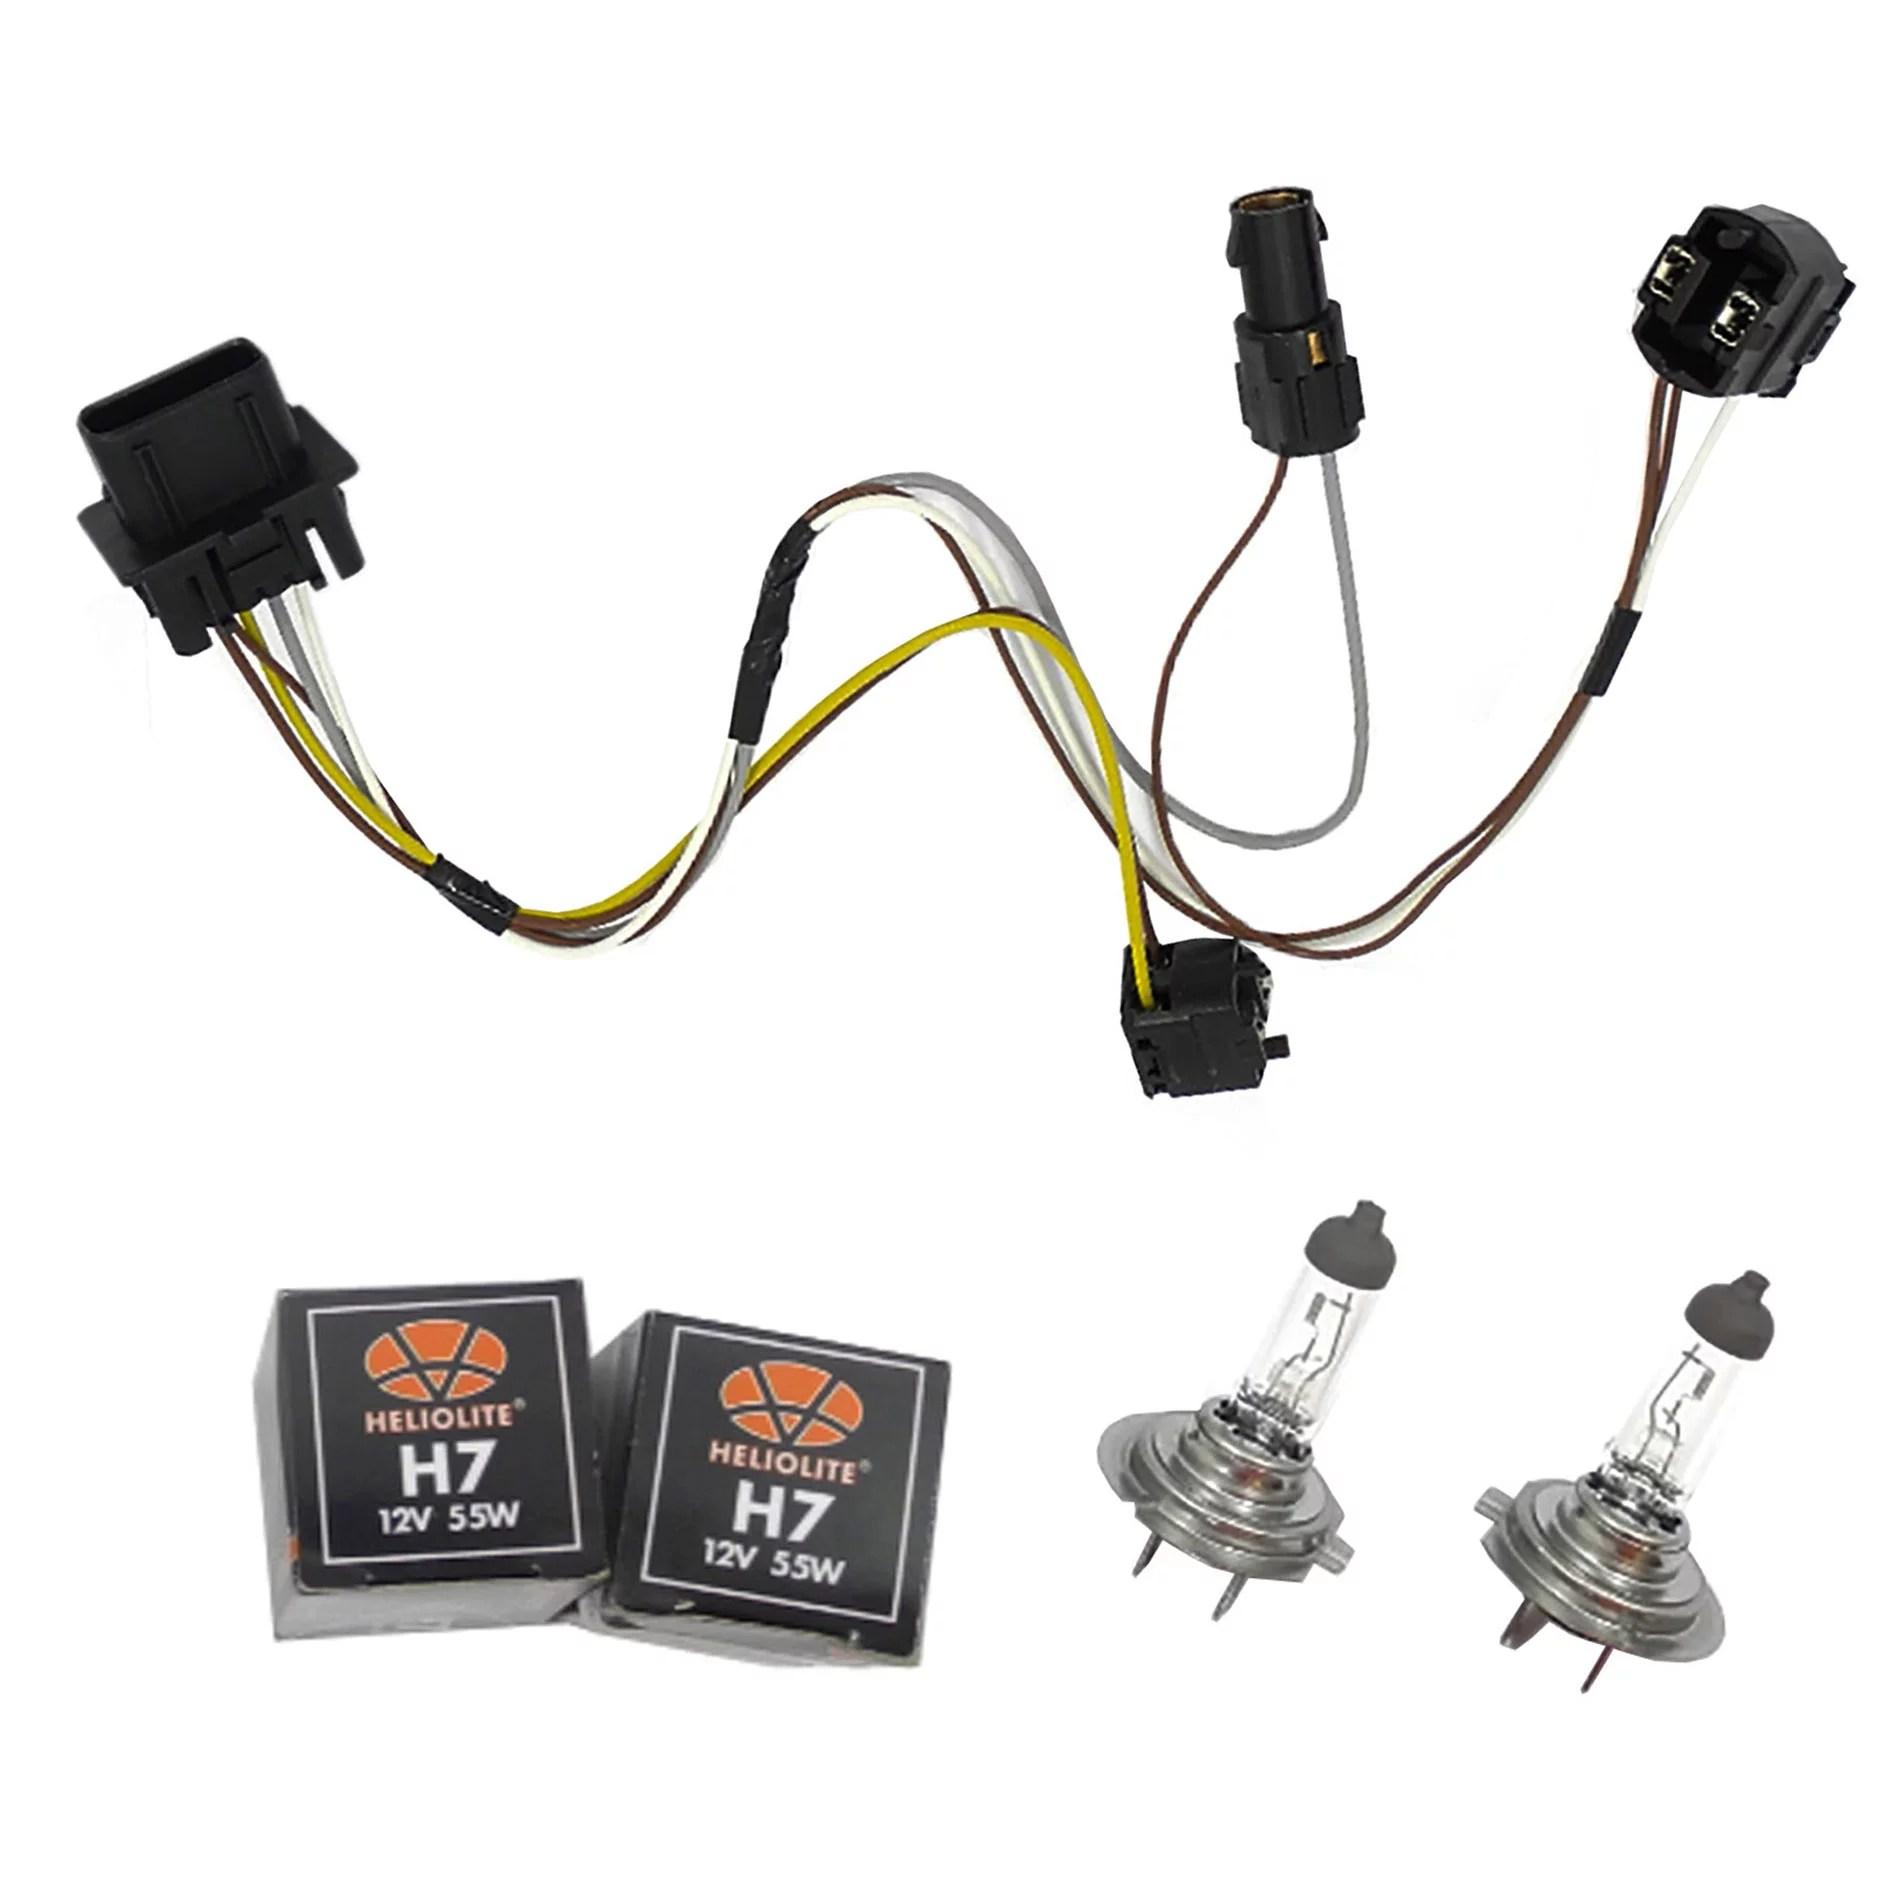 mercedes benz 2000 e320 headlight wiring harness wiring diagram fascinating [ 1900 x 1900 Pixel ]